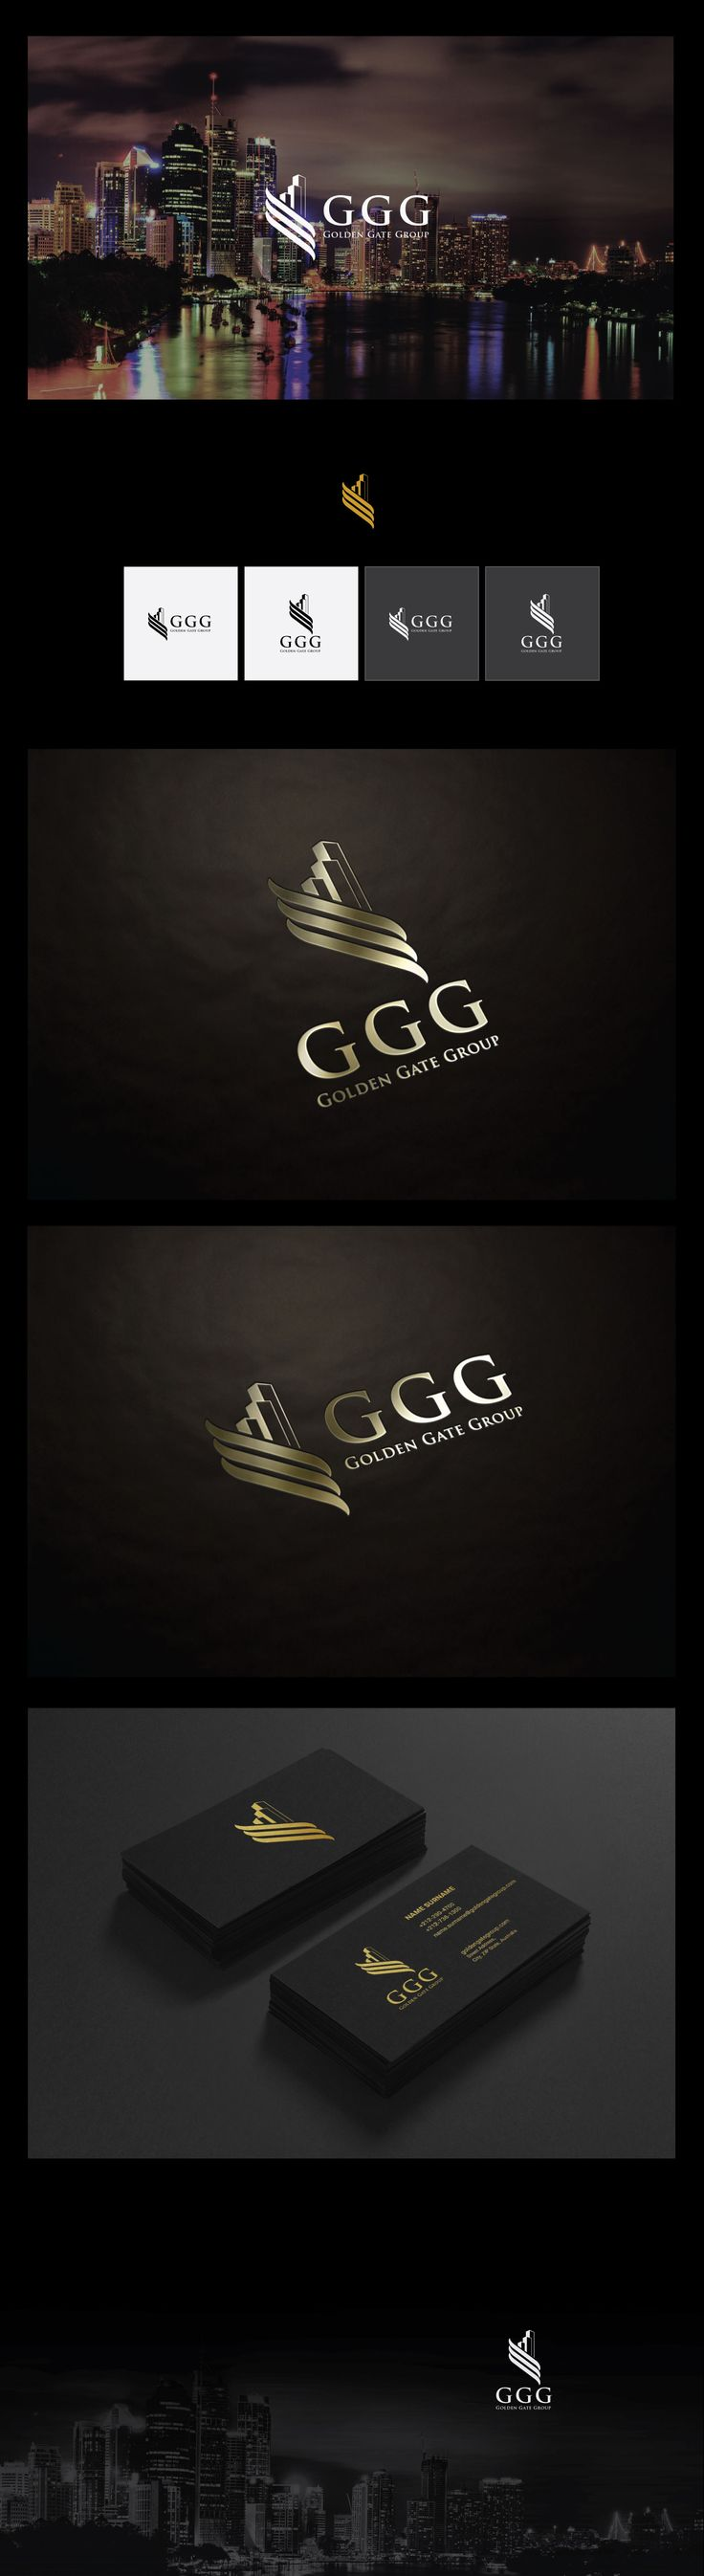 Real estate logo design.